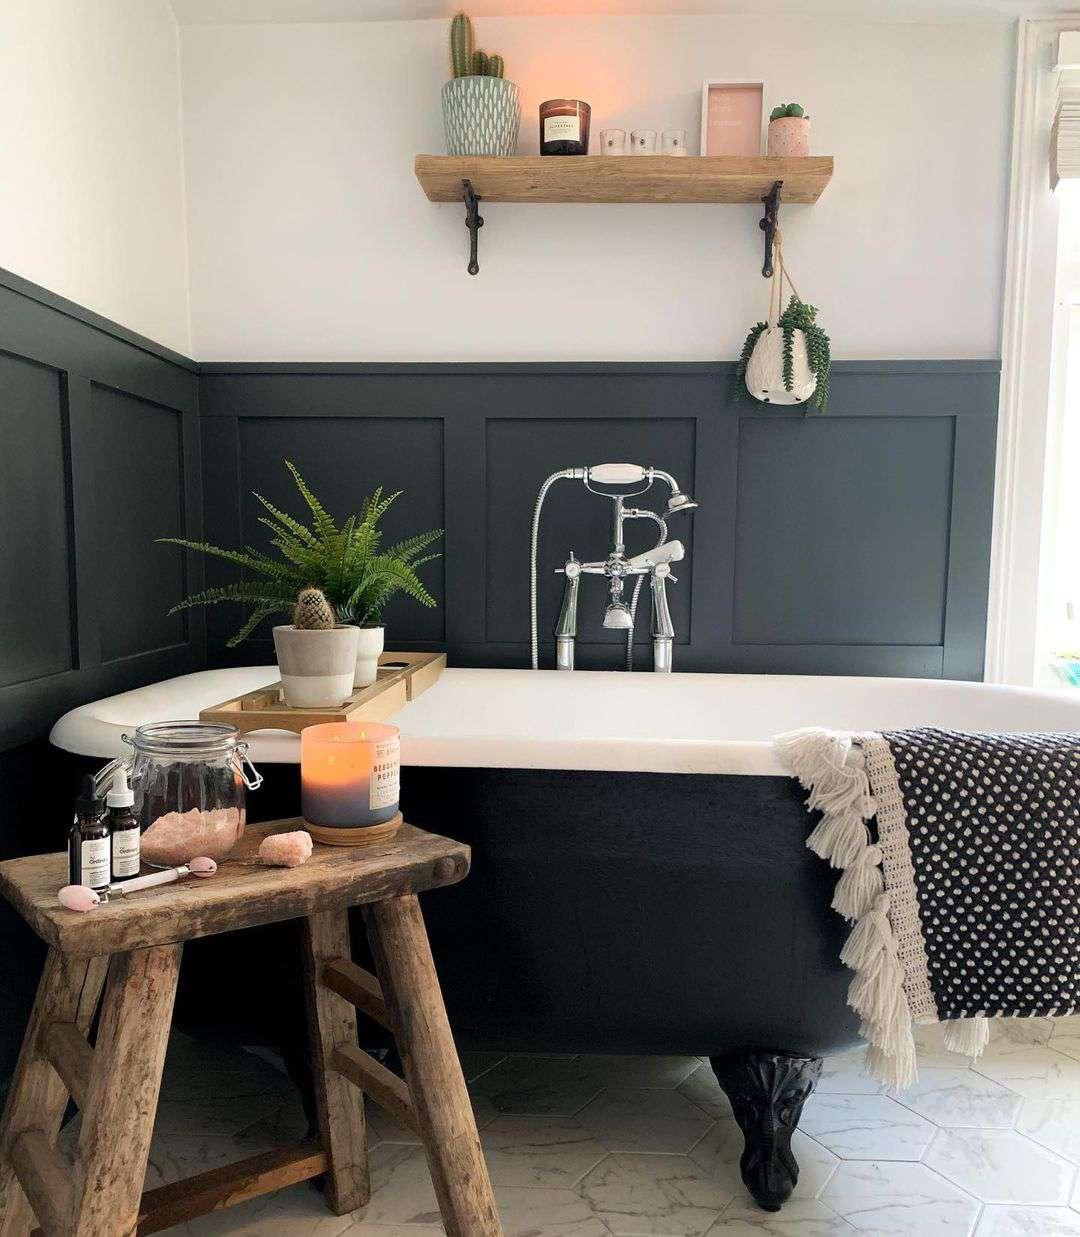 Bathroom with paneling